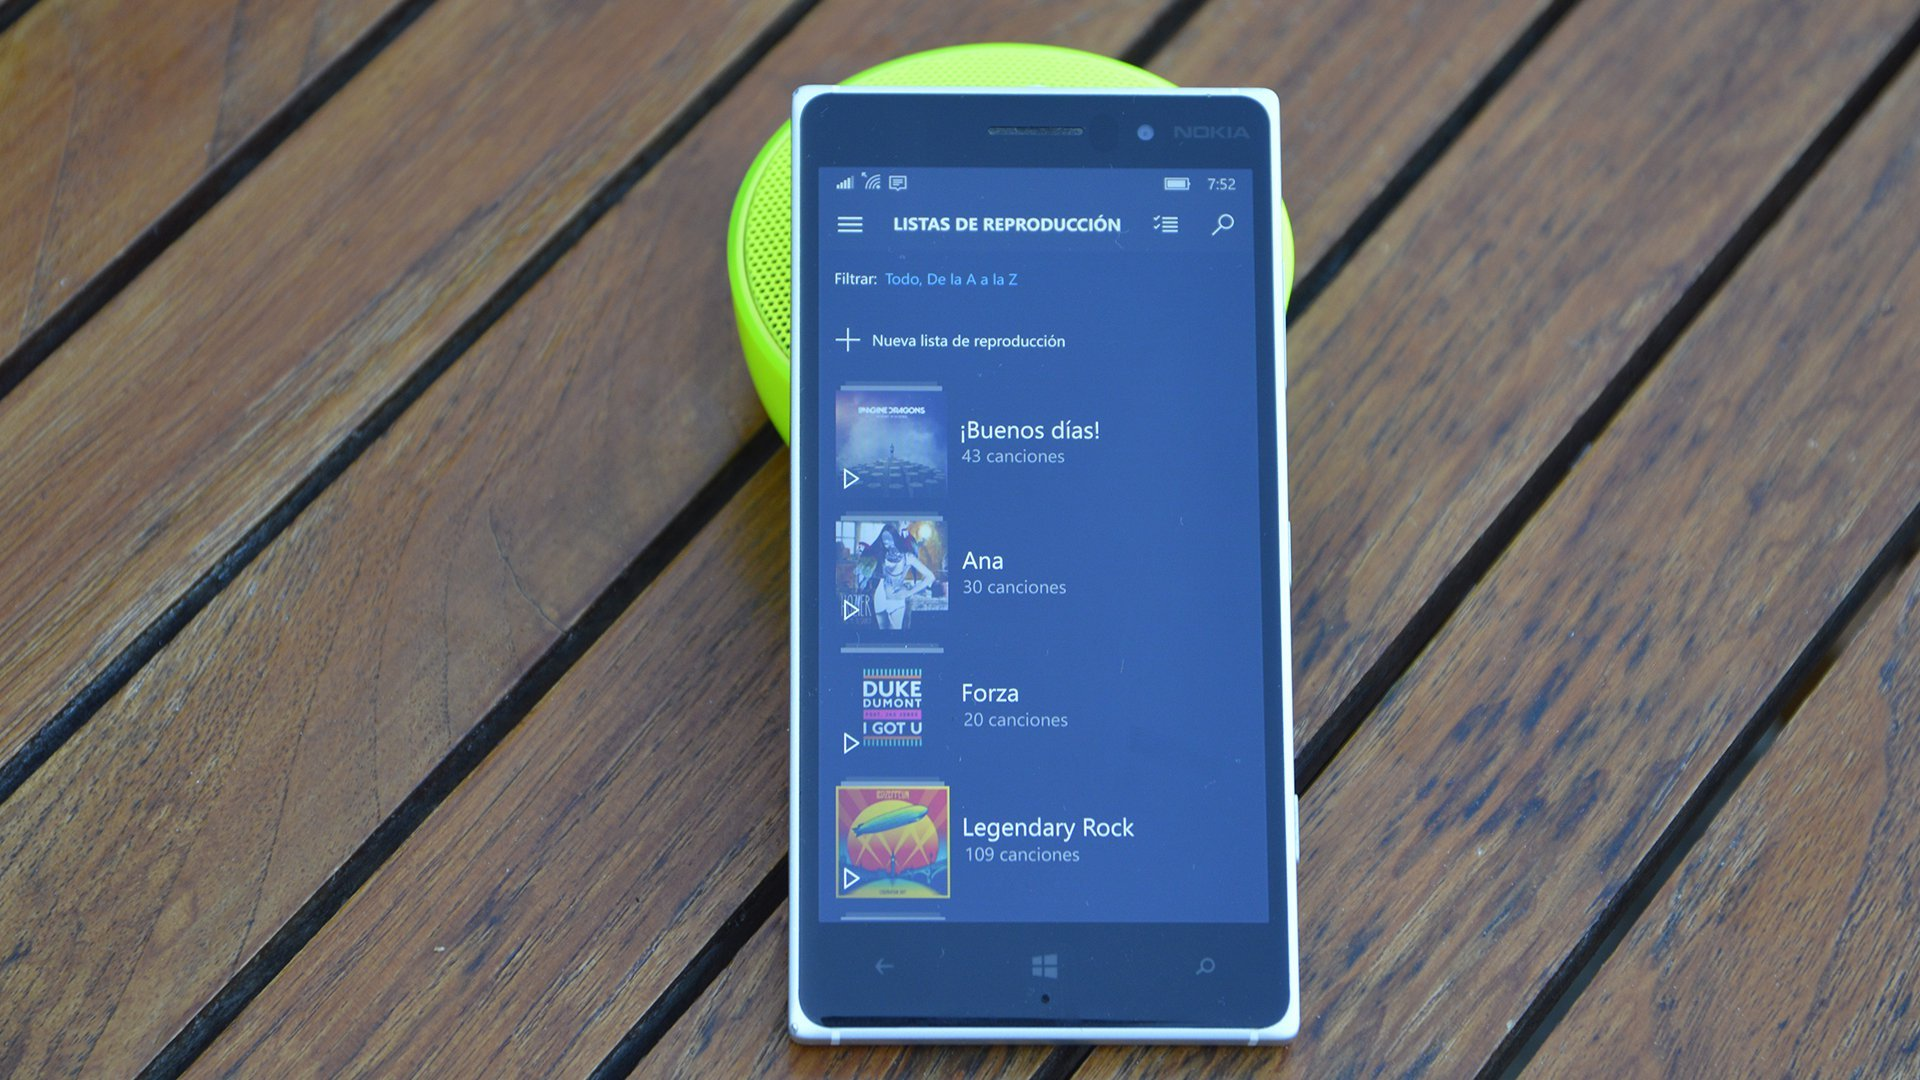 Lumia 830 con la app abierta